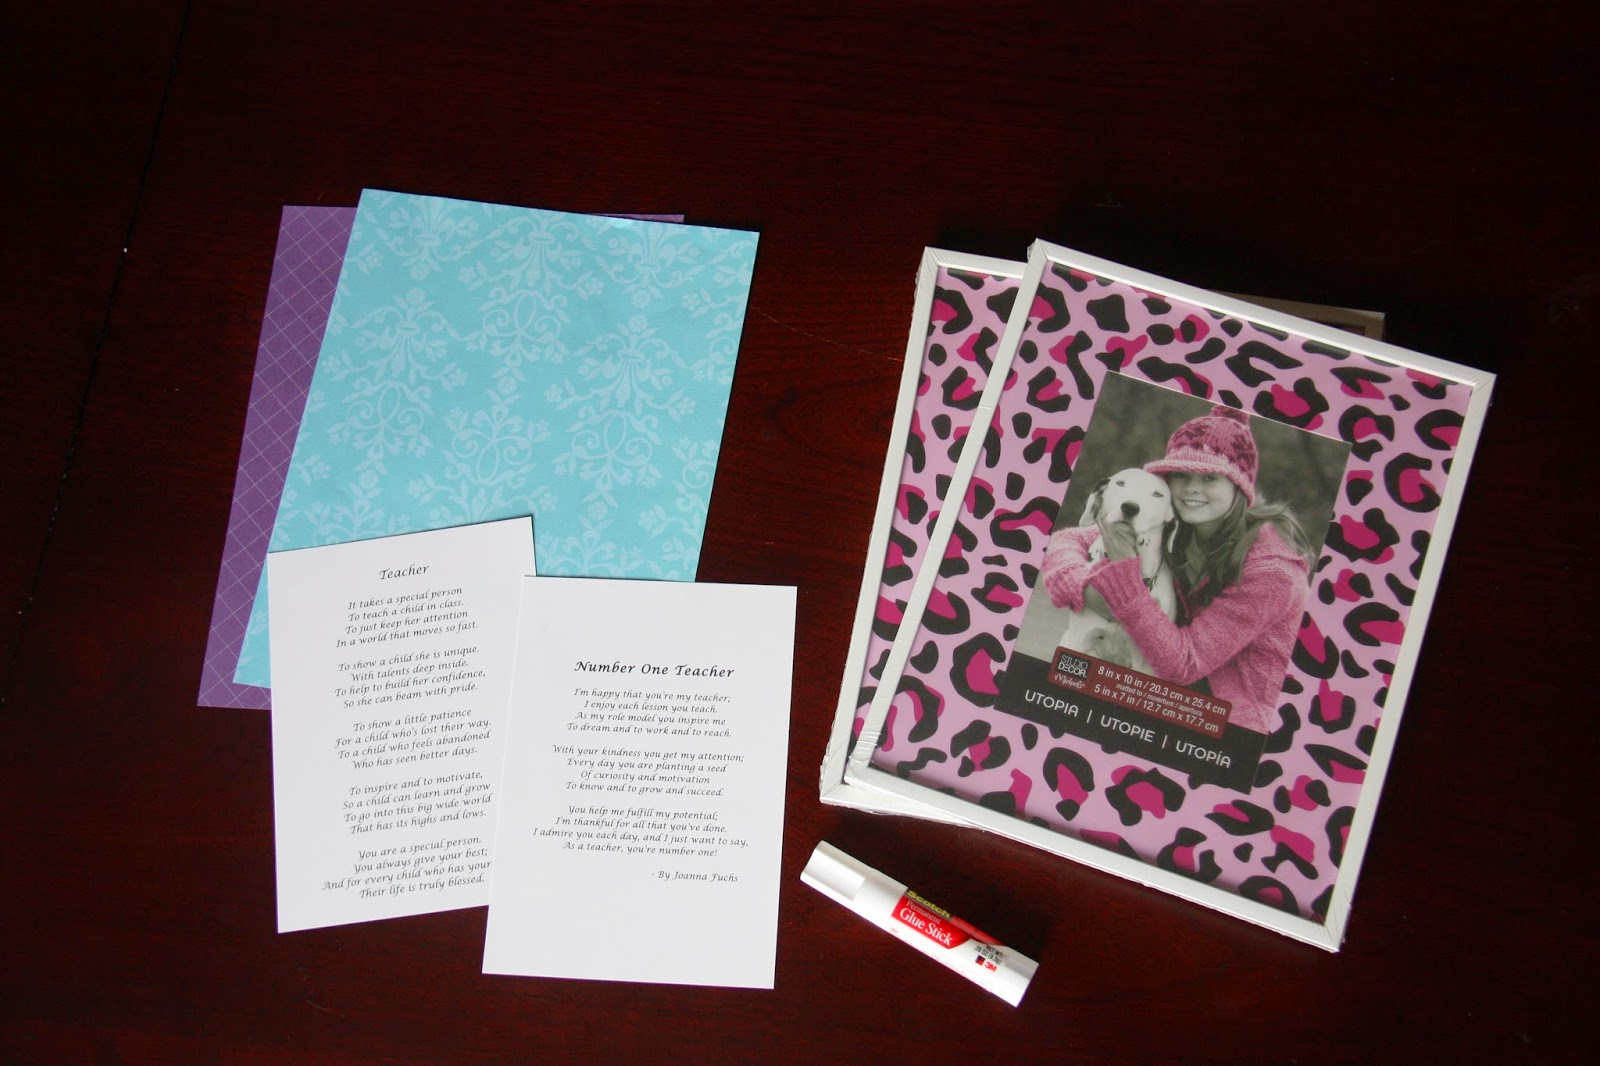 Teacher Appreciation Gift: A Framed Poem - The Lovebugs Blog